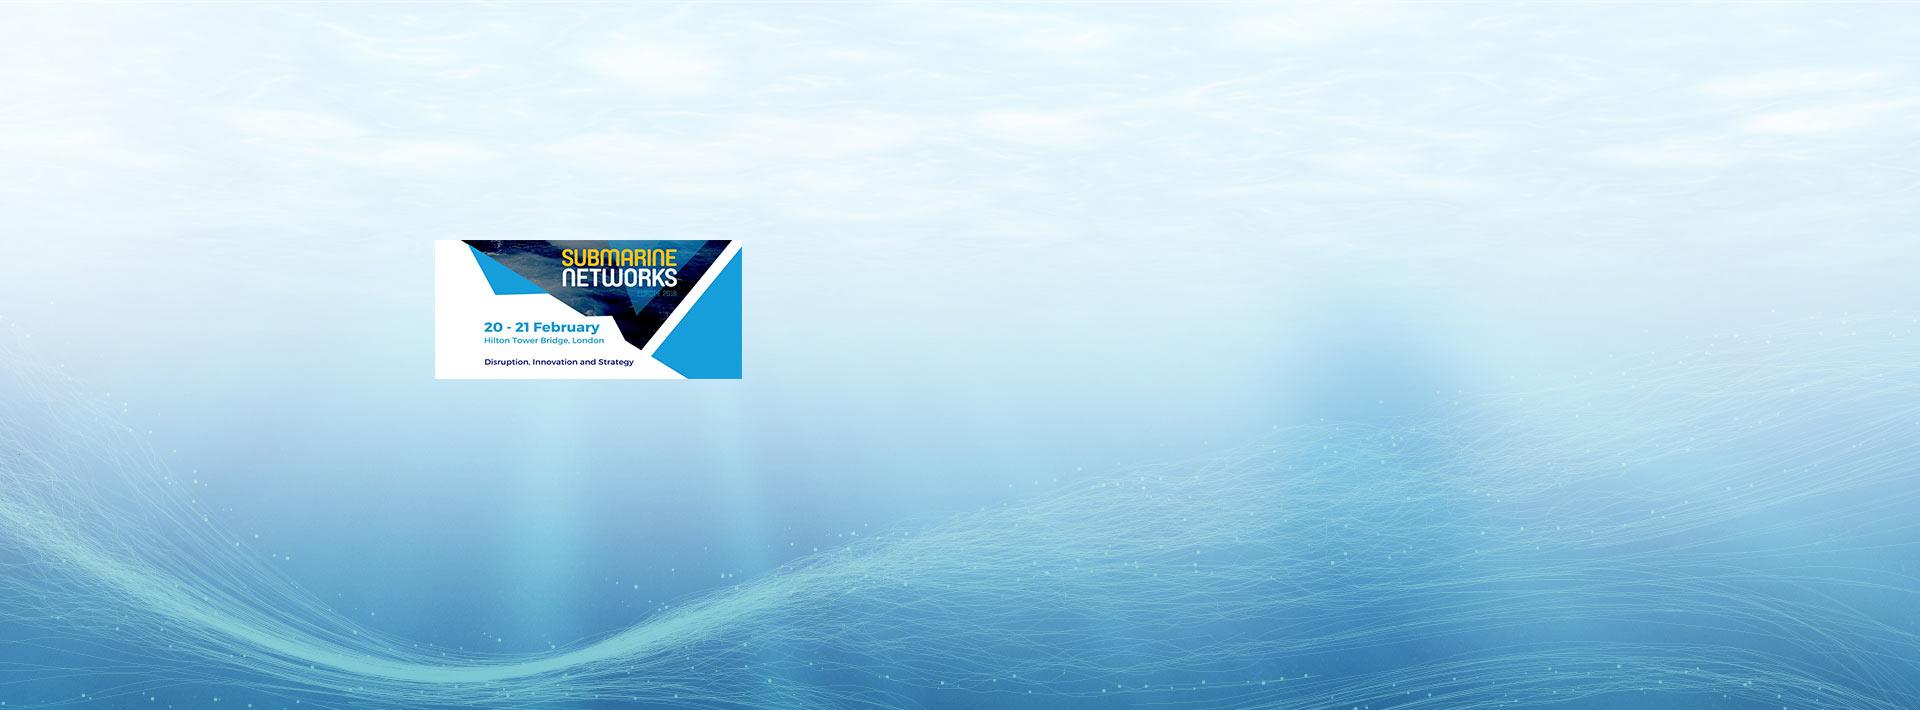 Meet us at Submarine Networks Europe 2018